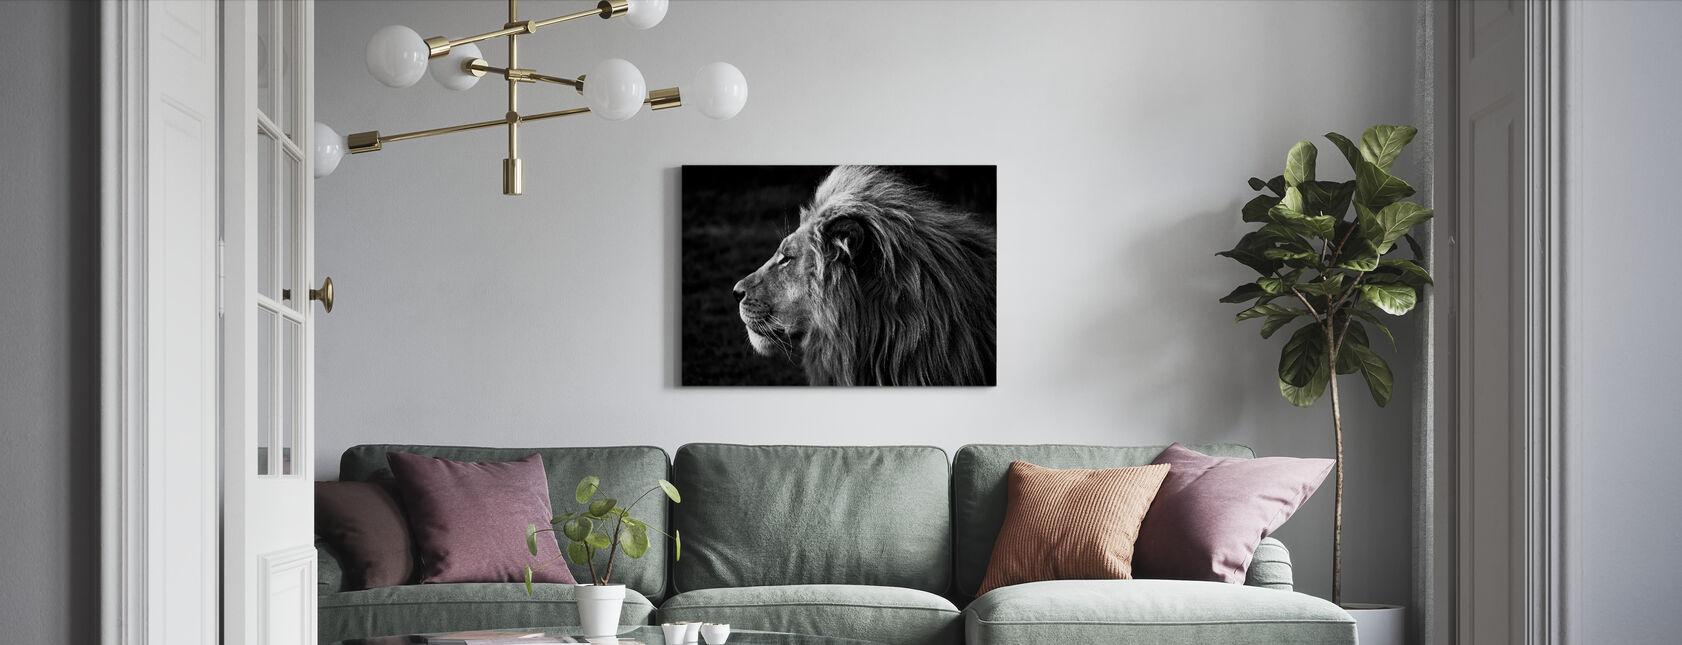 Løve - Lerretsbilde - Stue